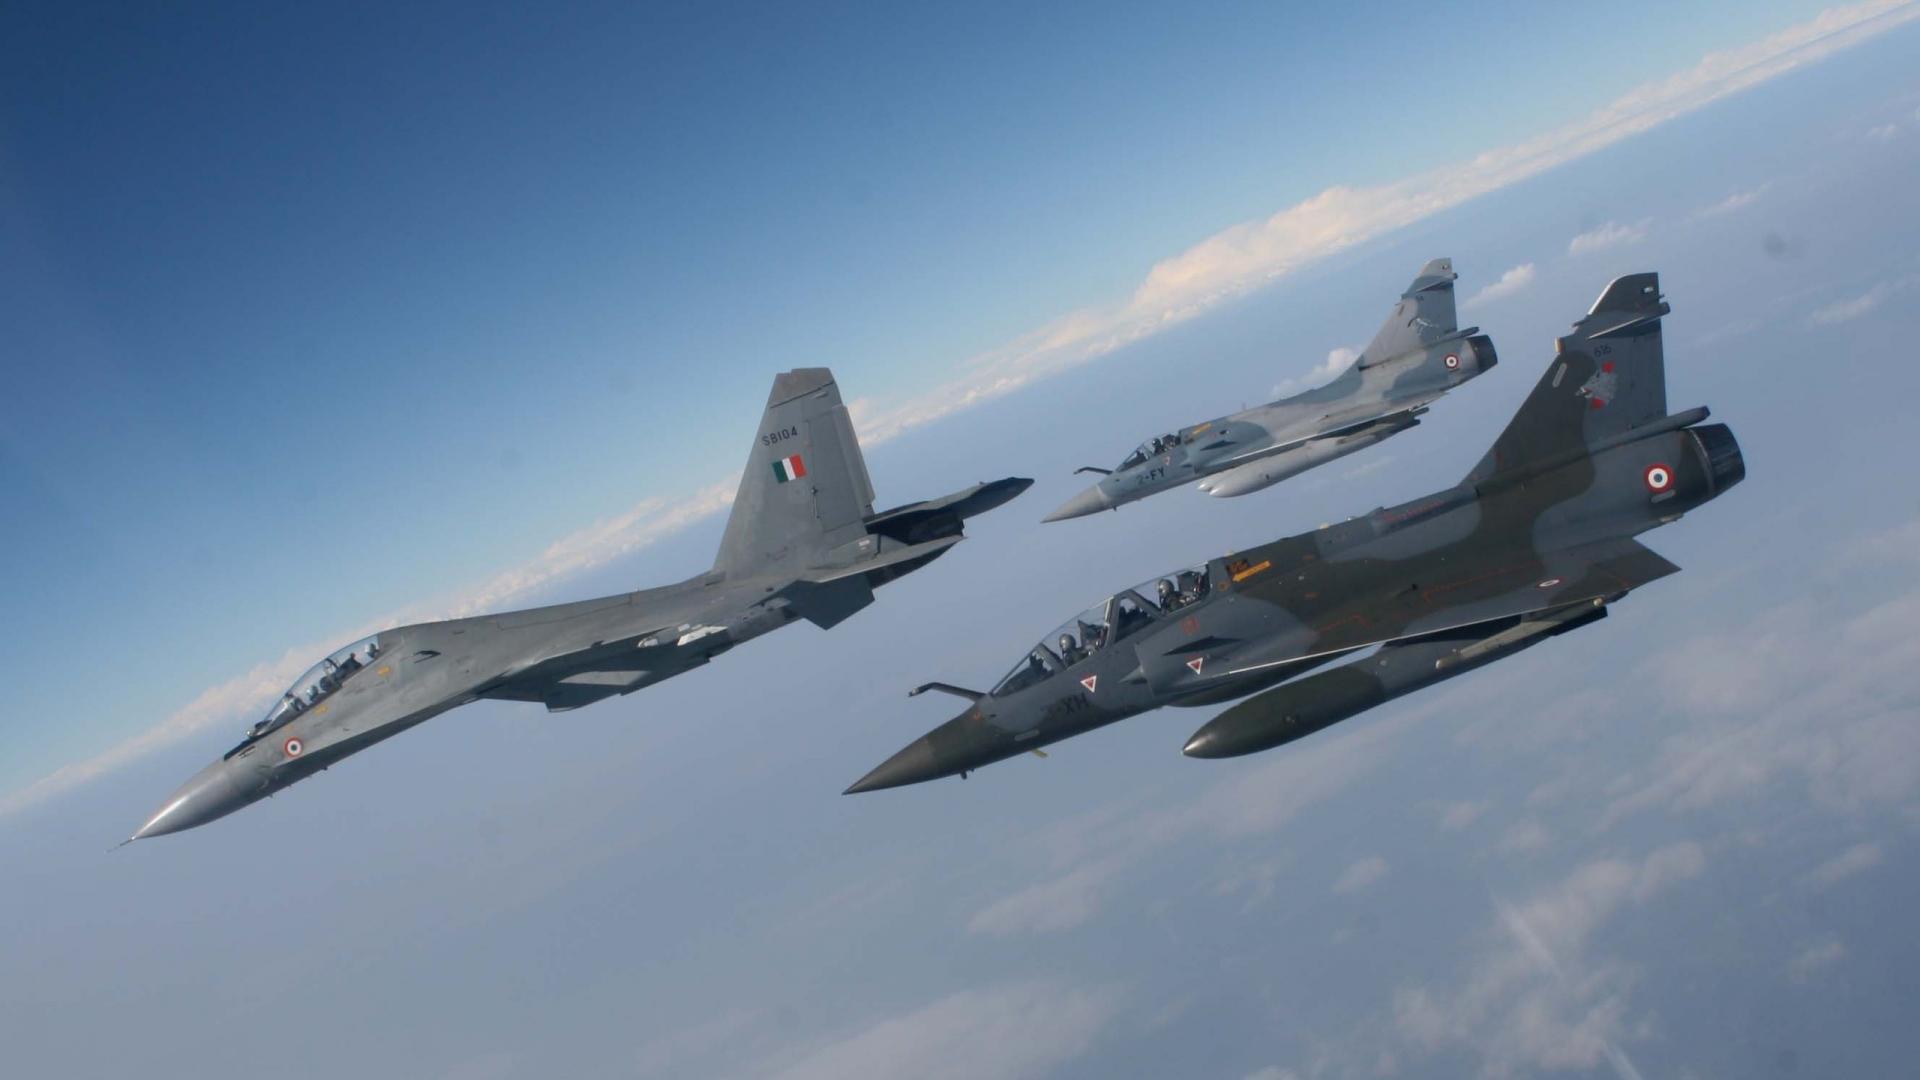 Download Fighter Pilot Wallpaper Hd Backgrounds Download